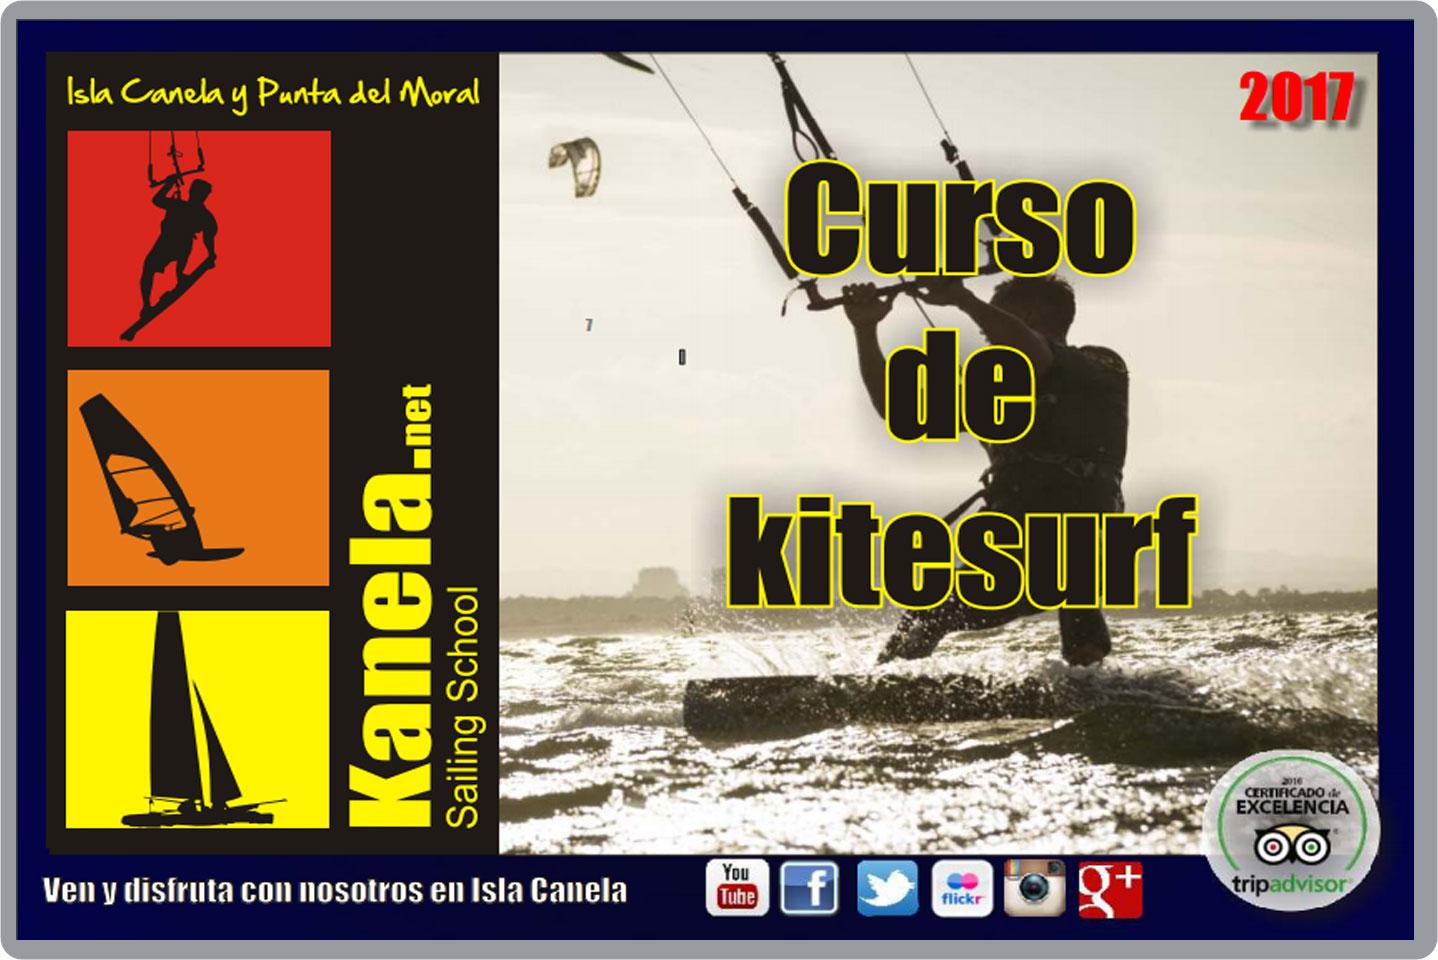 Dossier Curso Kite Surf